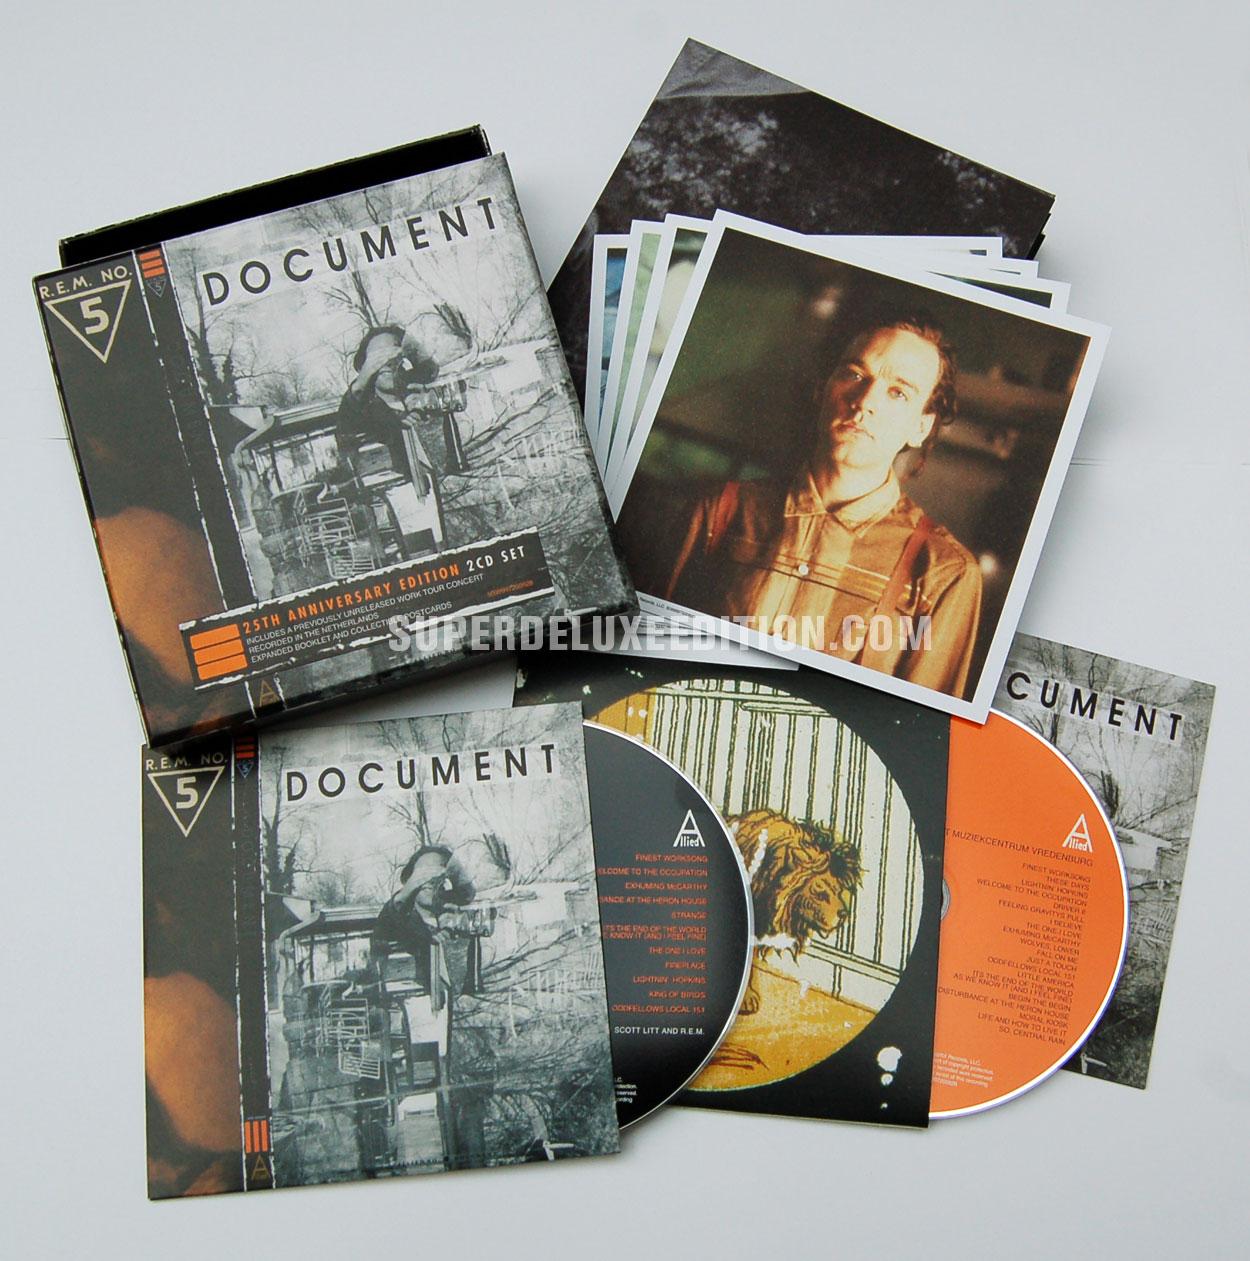 REM Document / 25th Anniversary Edition